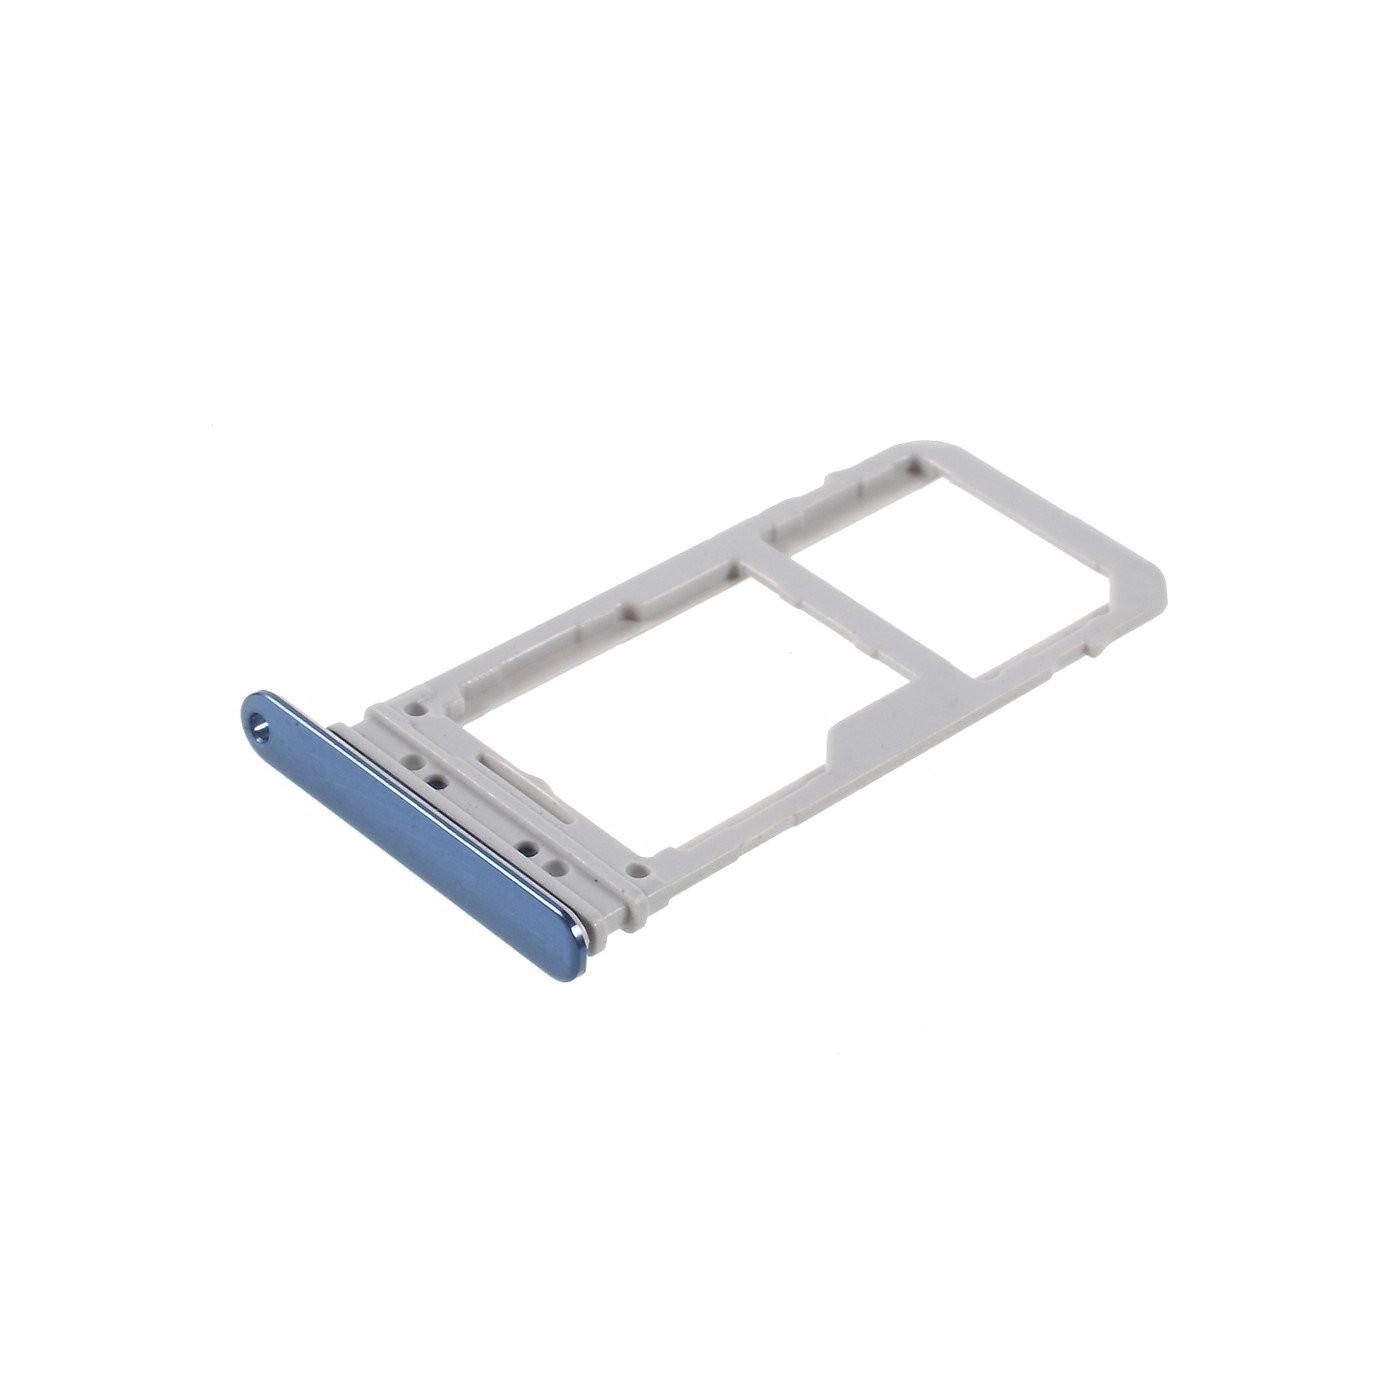 Soporte para SIM para Samsung Note 8 N950F Blue Slot Sled